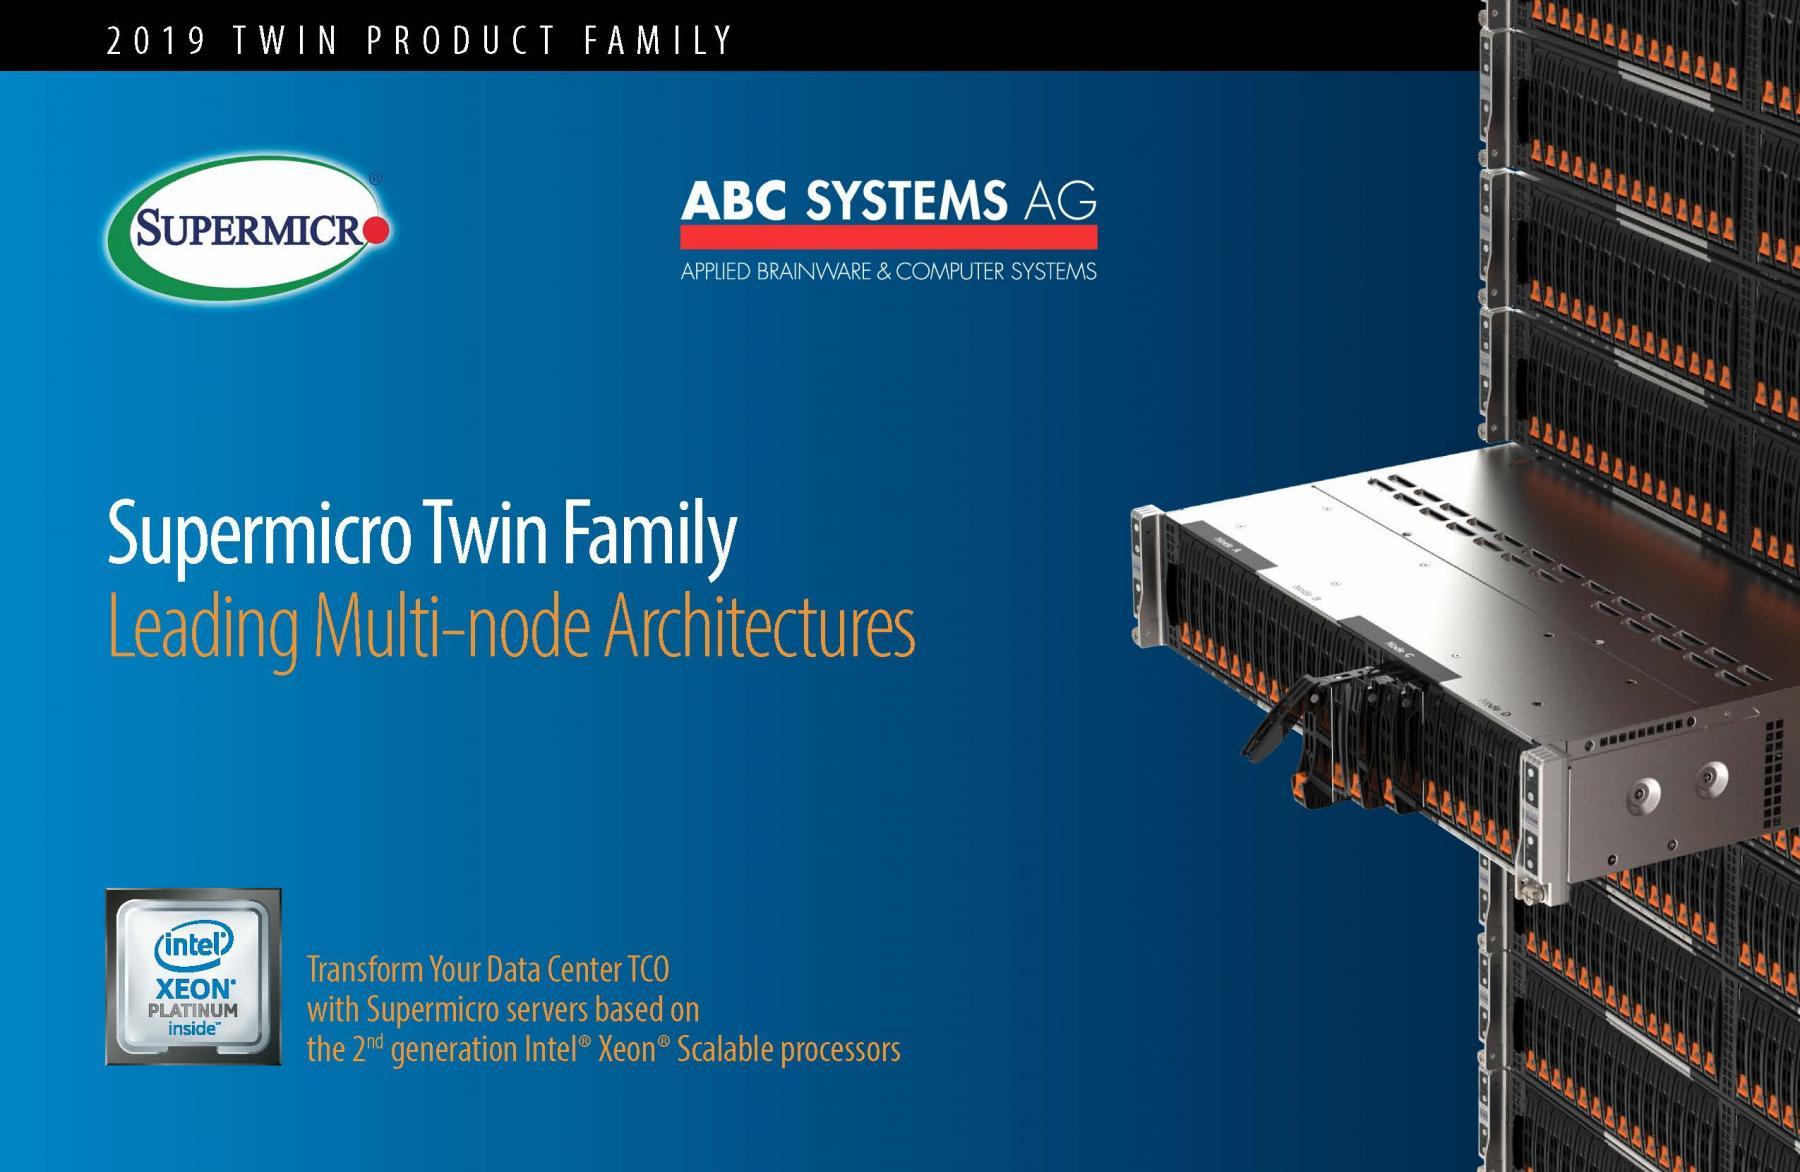 02 twin-family half 190716 rev1 ABC 1